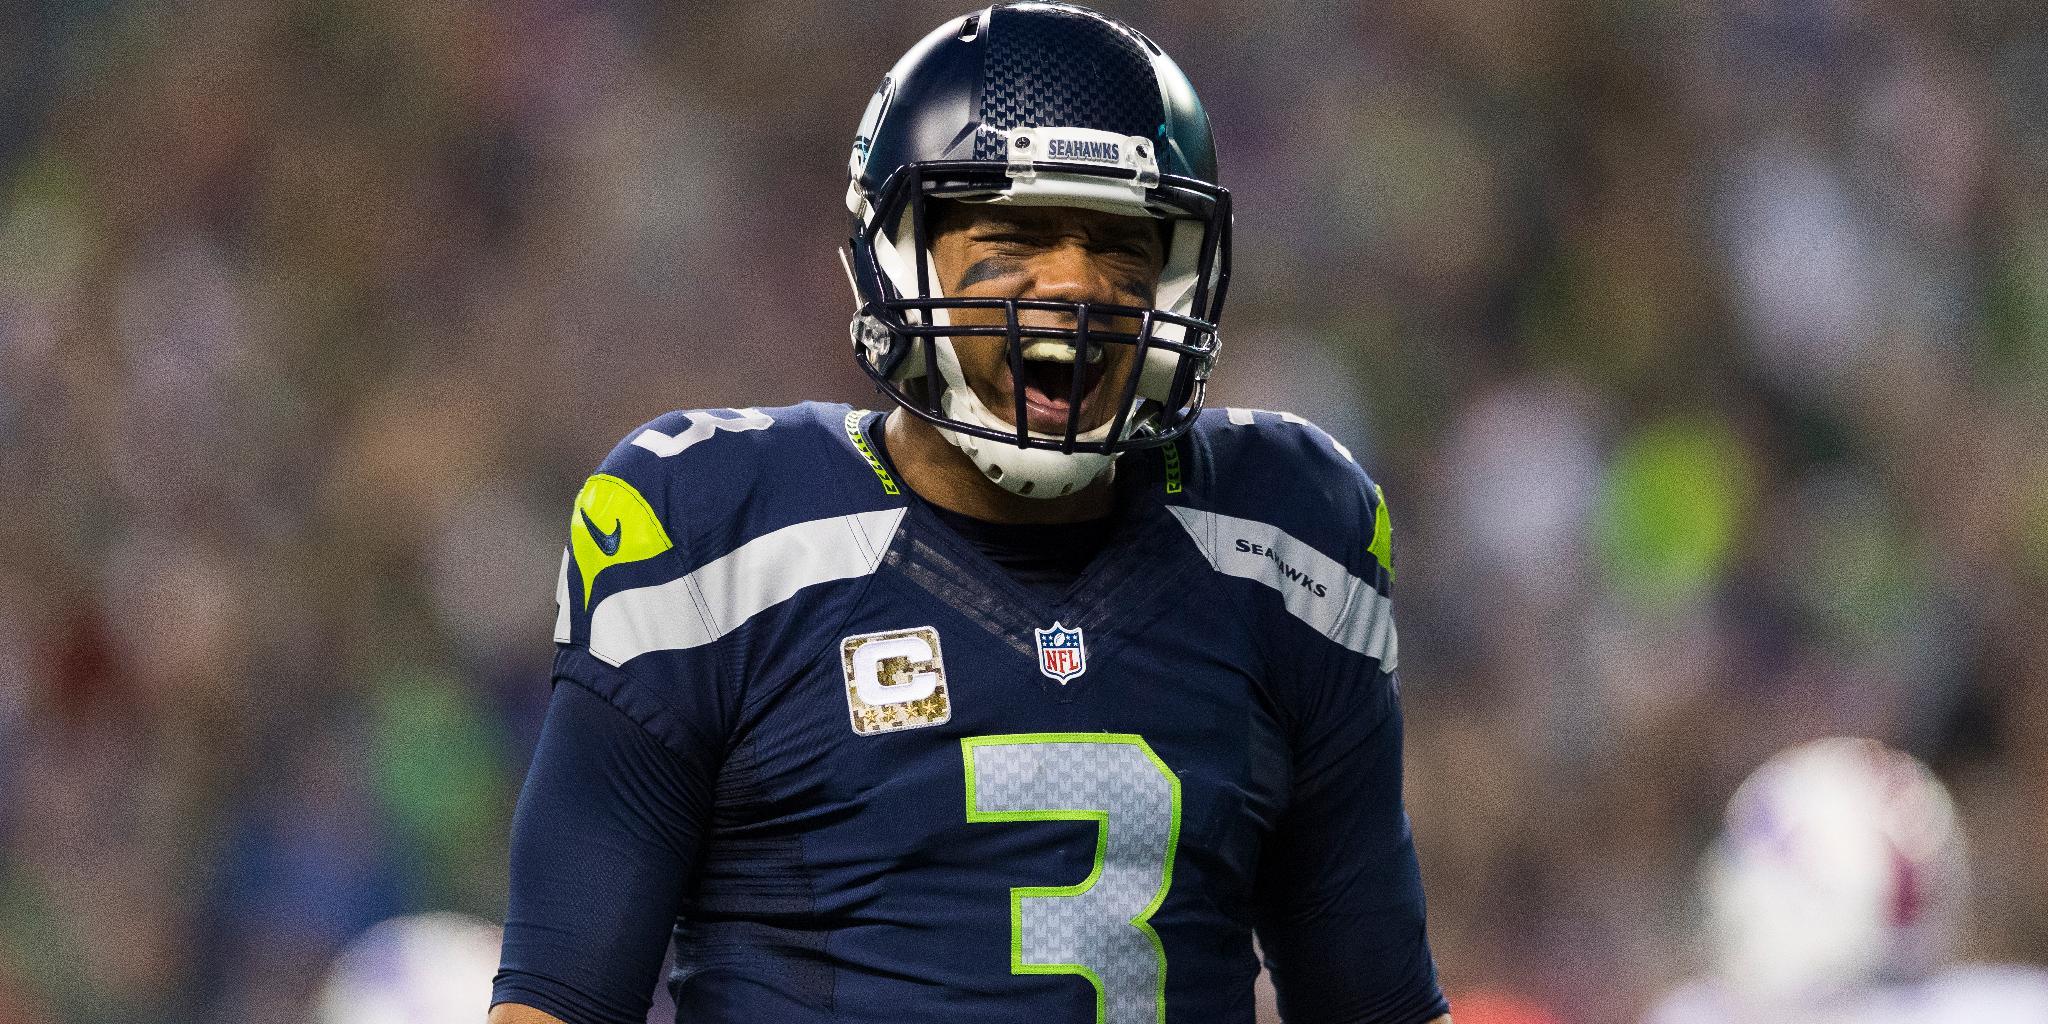 9 NFL stars who carry their teams like @KingJames: https://t.co/3NAVbnusTl (via @AdamSchein) https://t.co/nK6aGAHh4x